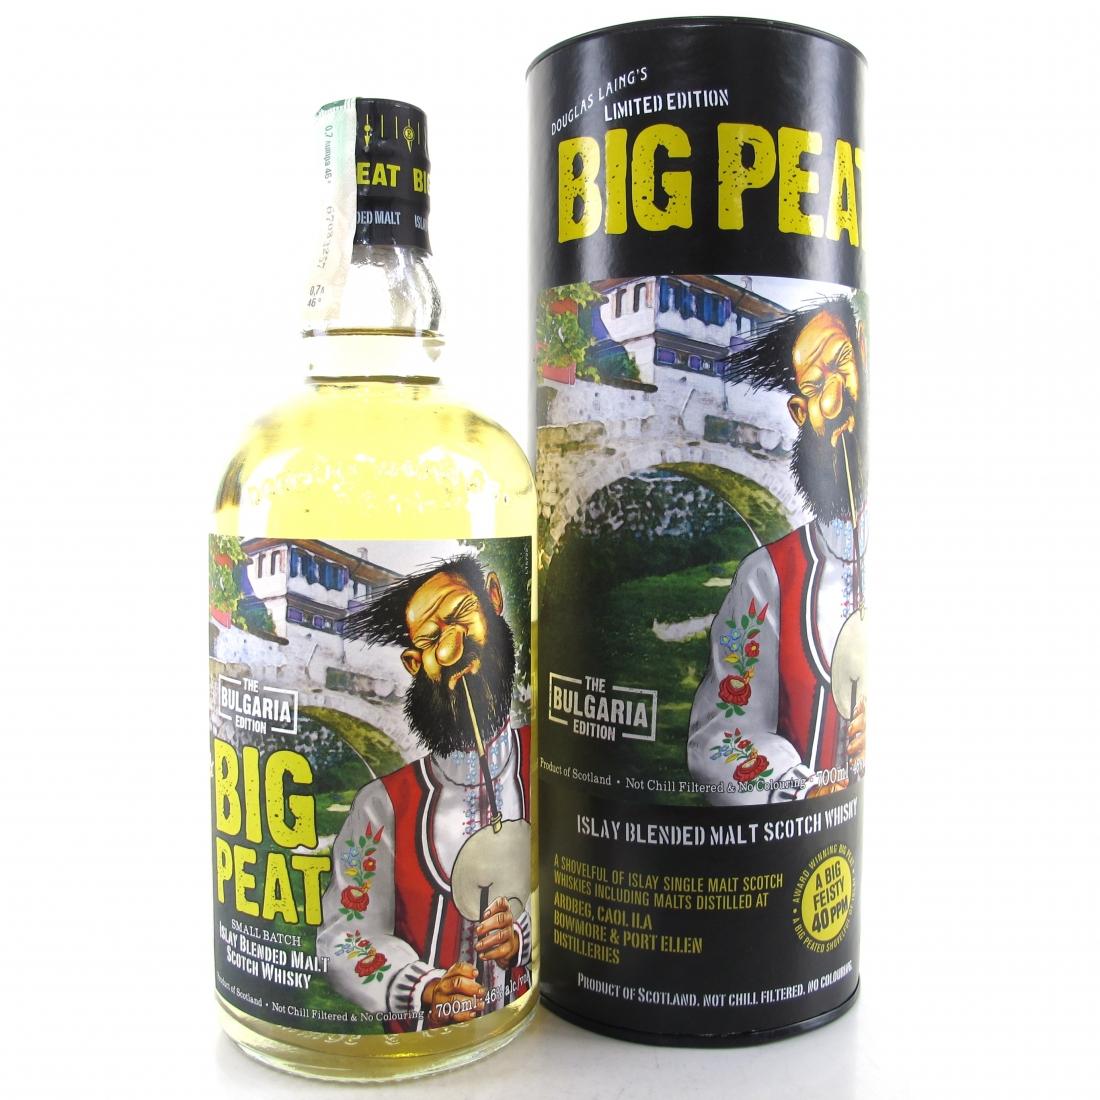 Big Peat The Bulgaria Edition